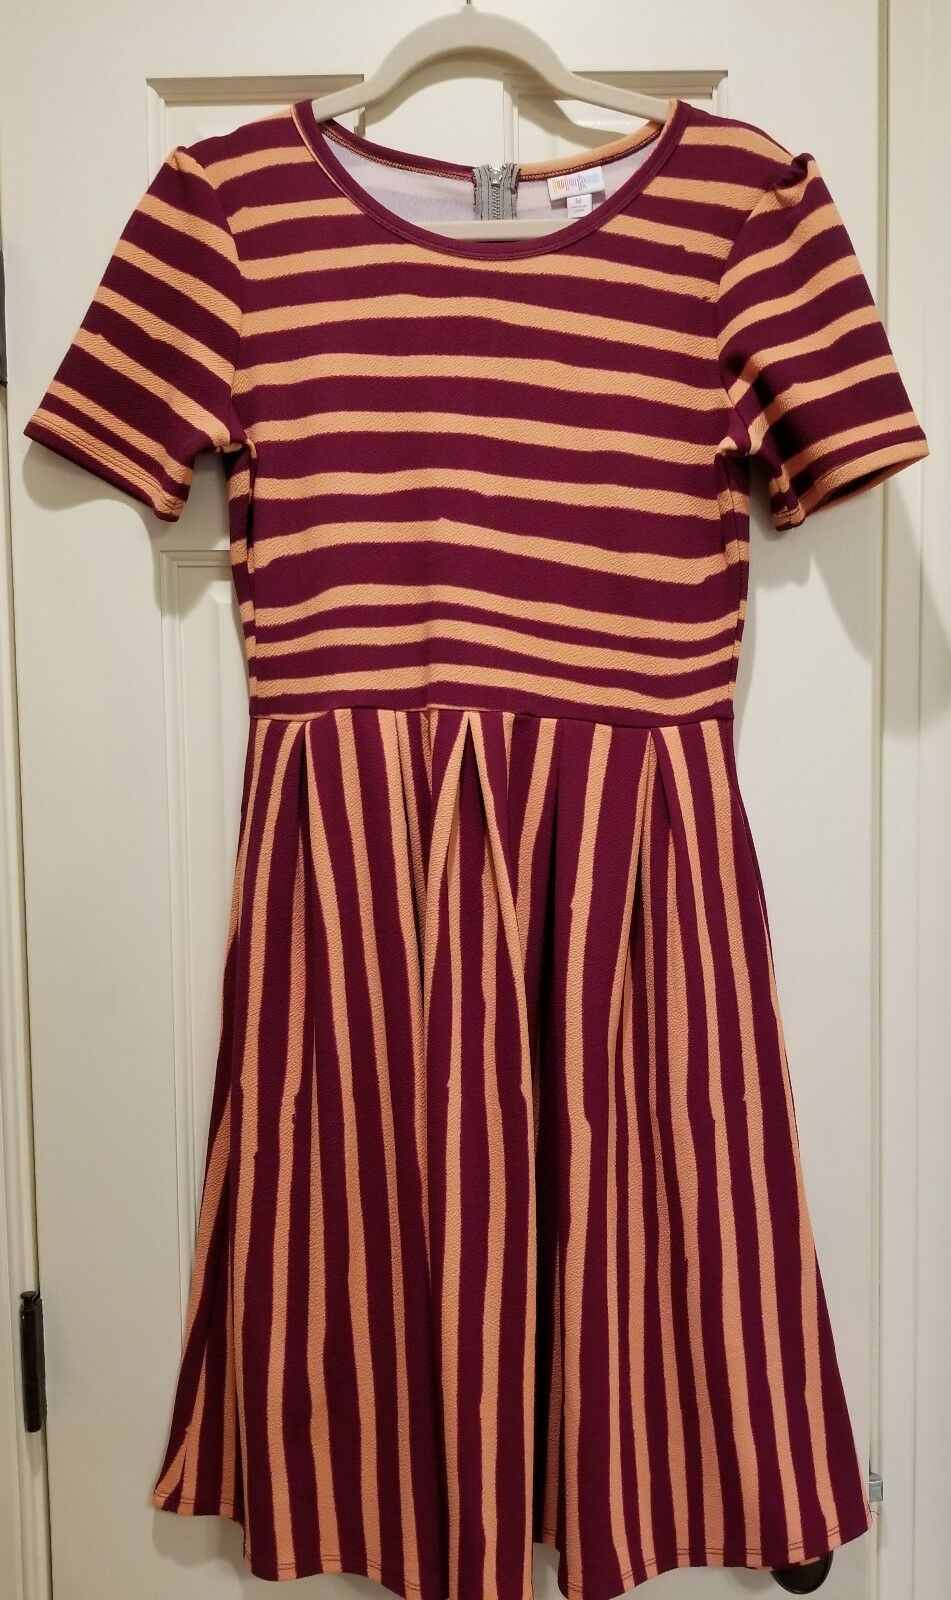 Lularoe Amelia, Burgundy And Peach Stripes Dress, Medium, Brand New Without Tags